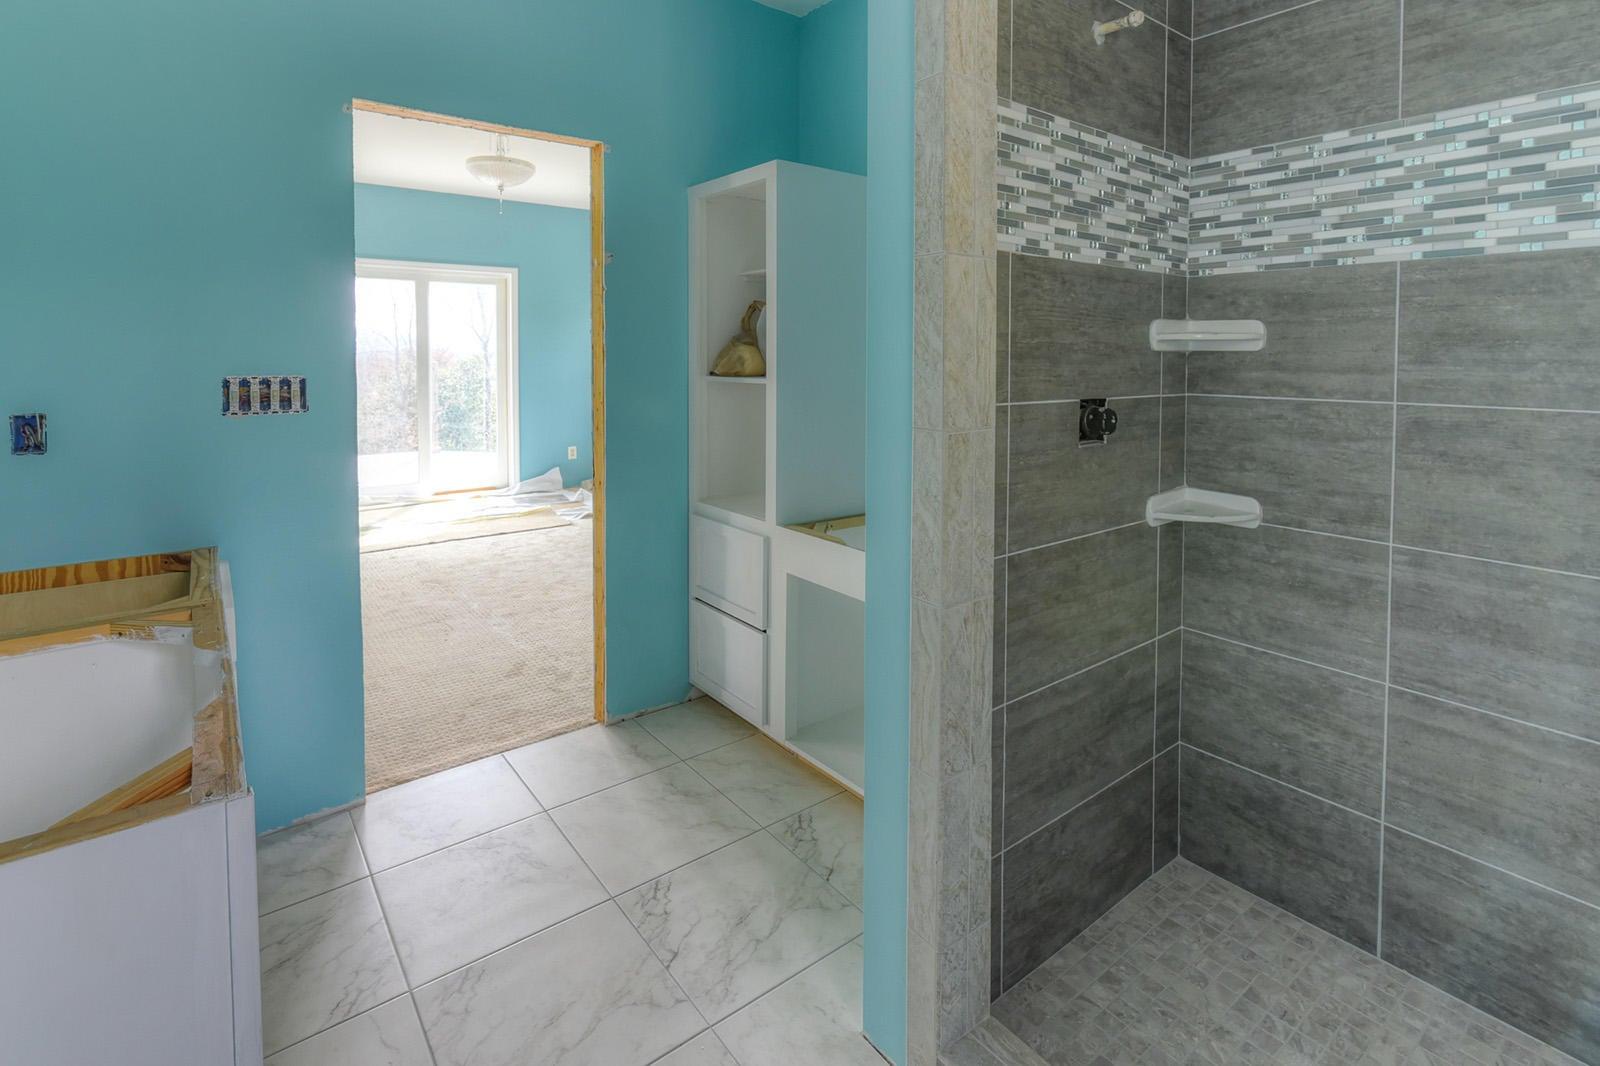 21 - Bedrm Mstr Bath